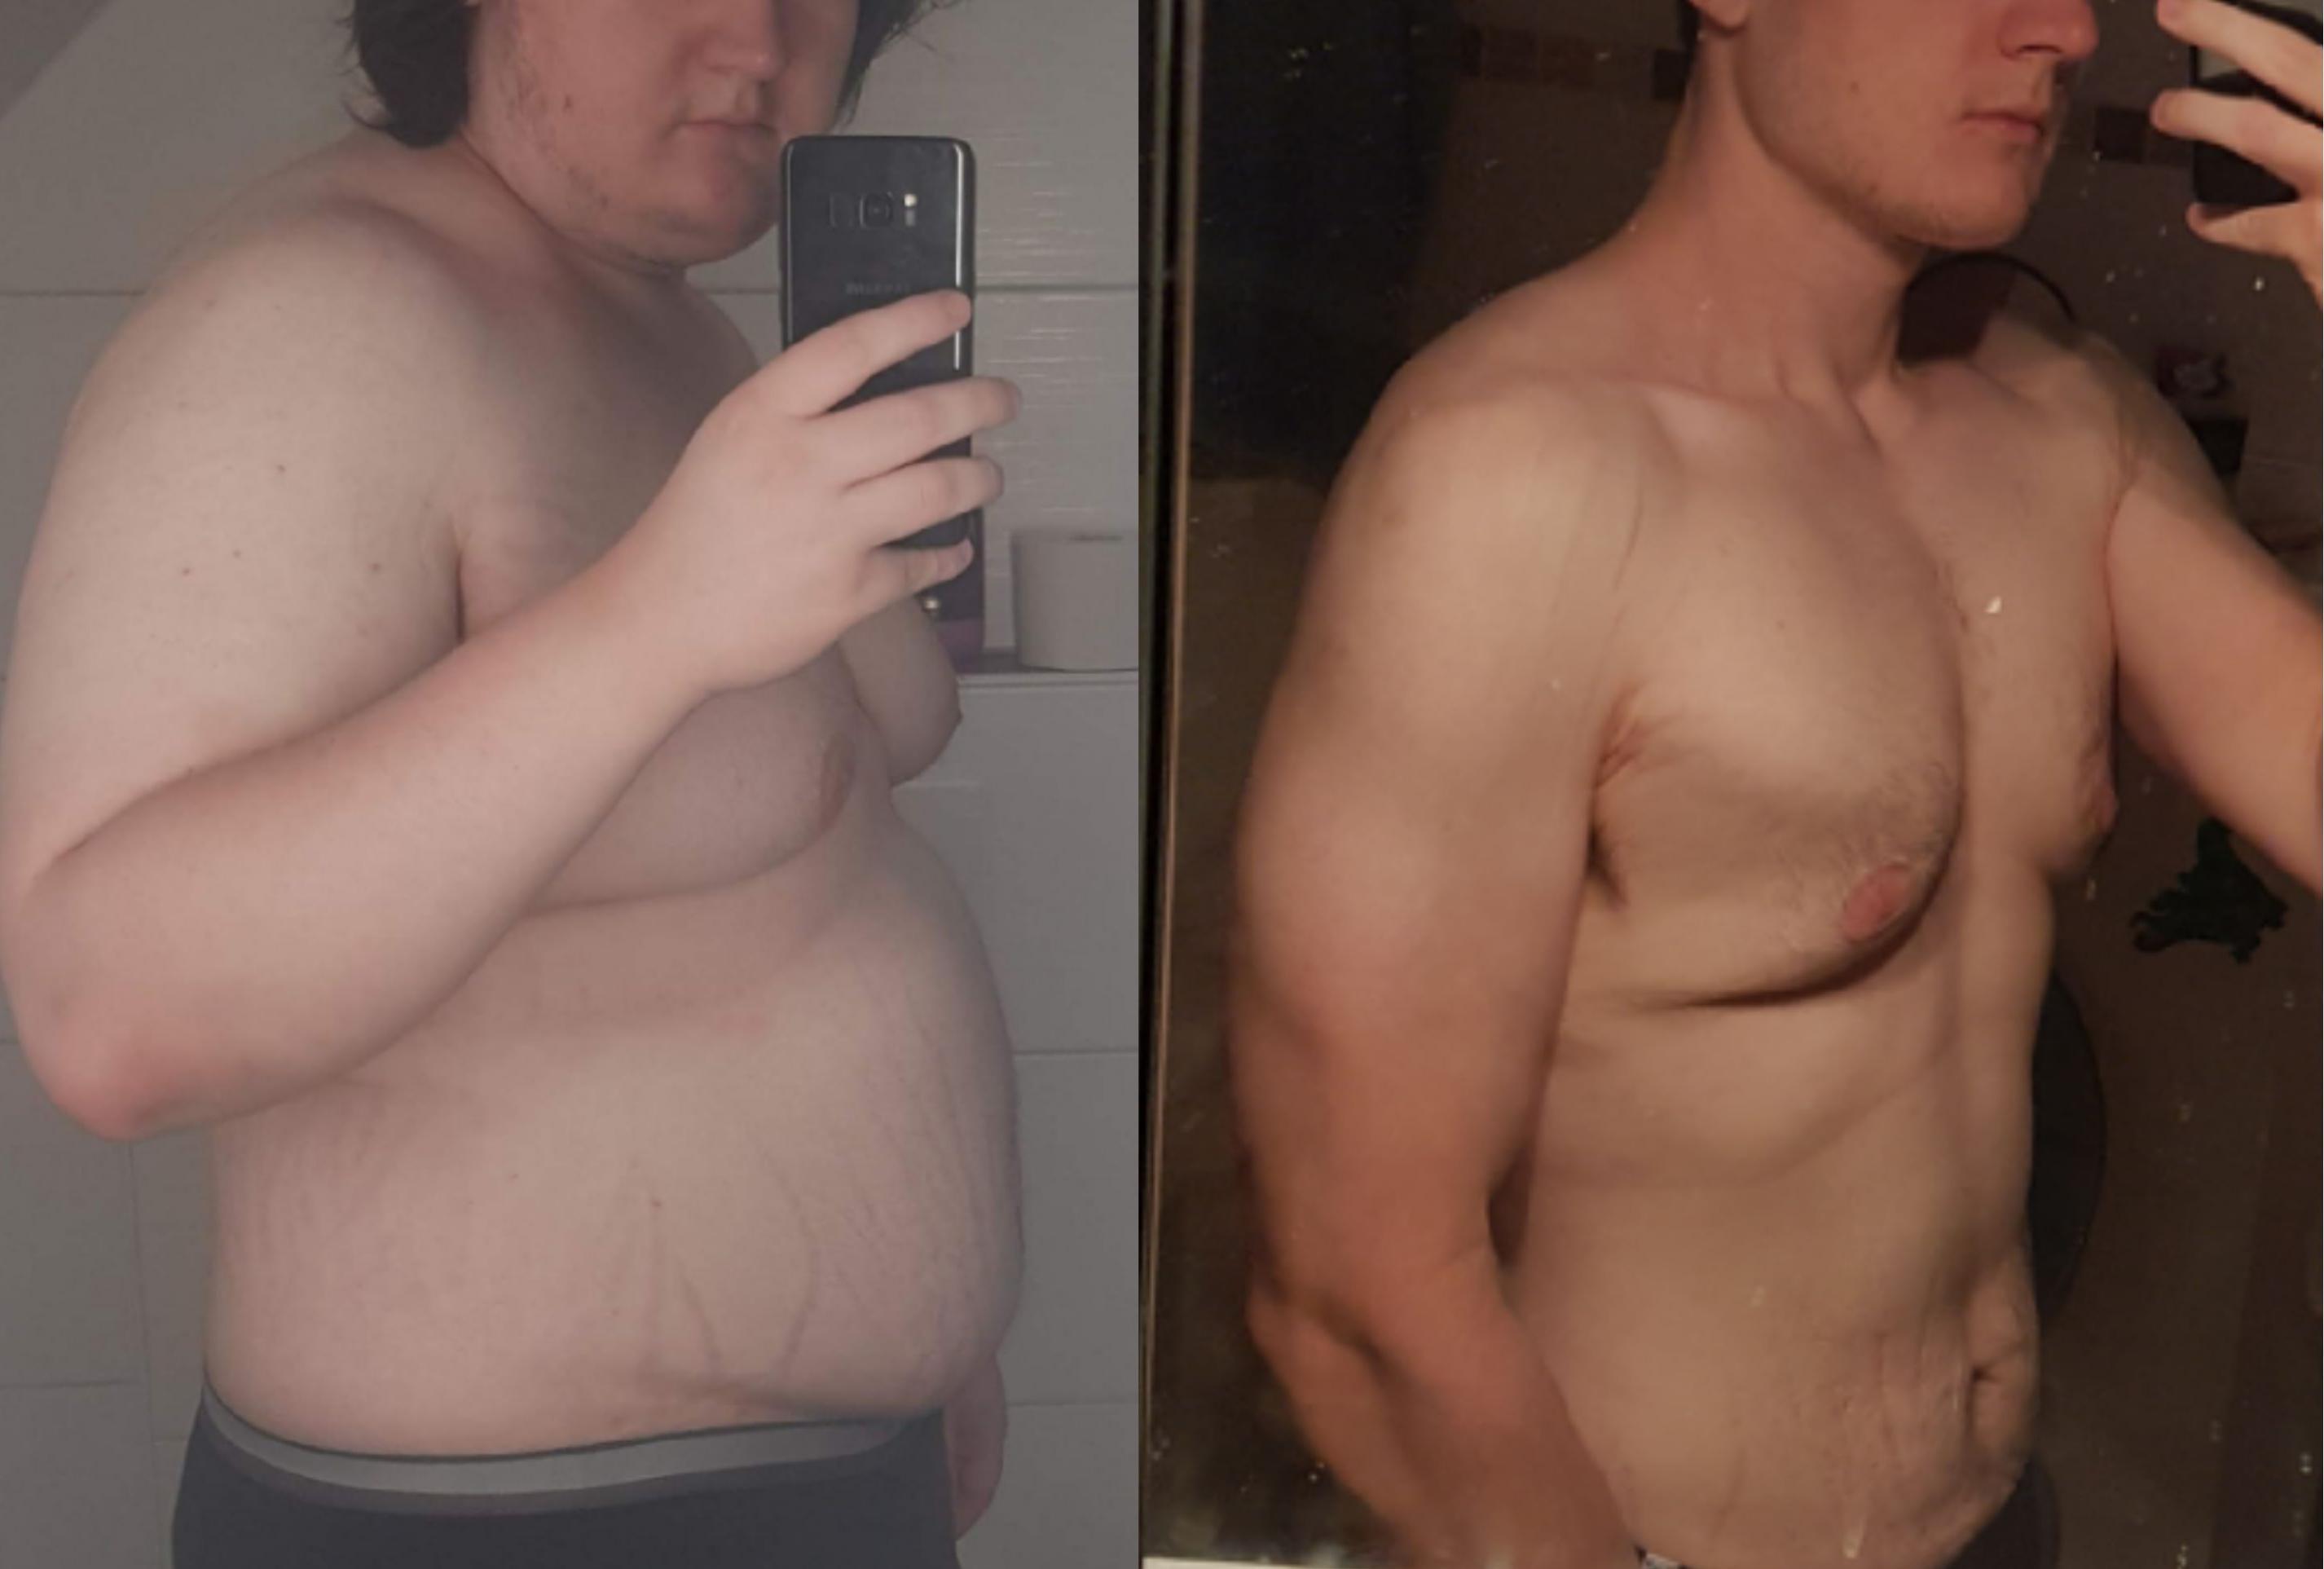 6 foot Male 150 lbs Fat Loss 333 lbs to 183 lbs